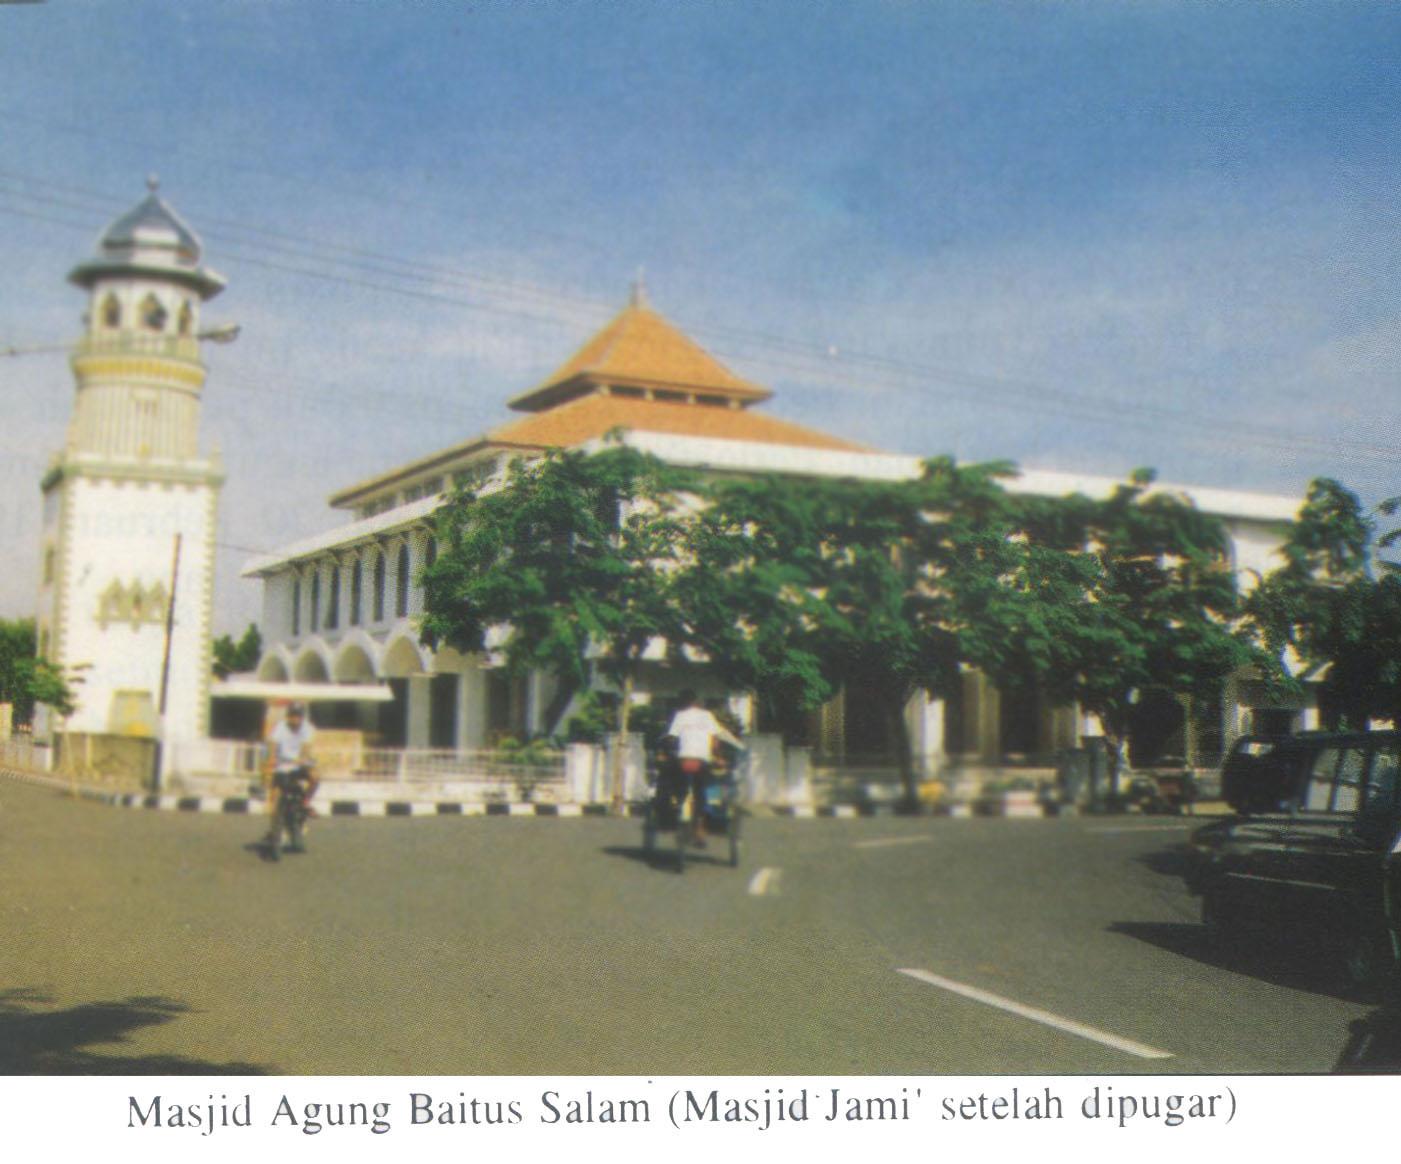 Masjid Agung Baitus Salam Kabupaten Nganjuk Pusaka Jawatimuran Kebun Teh